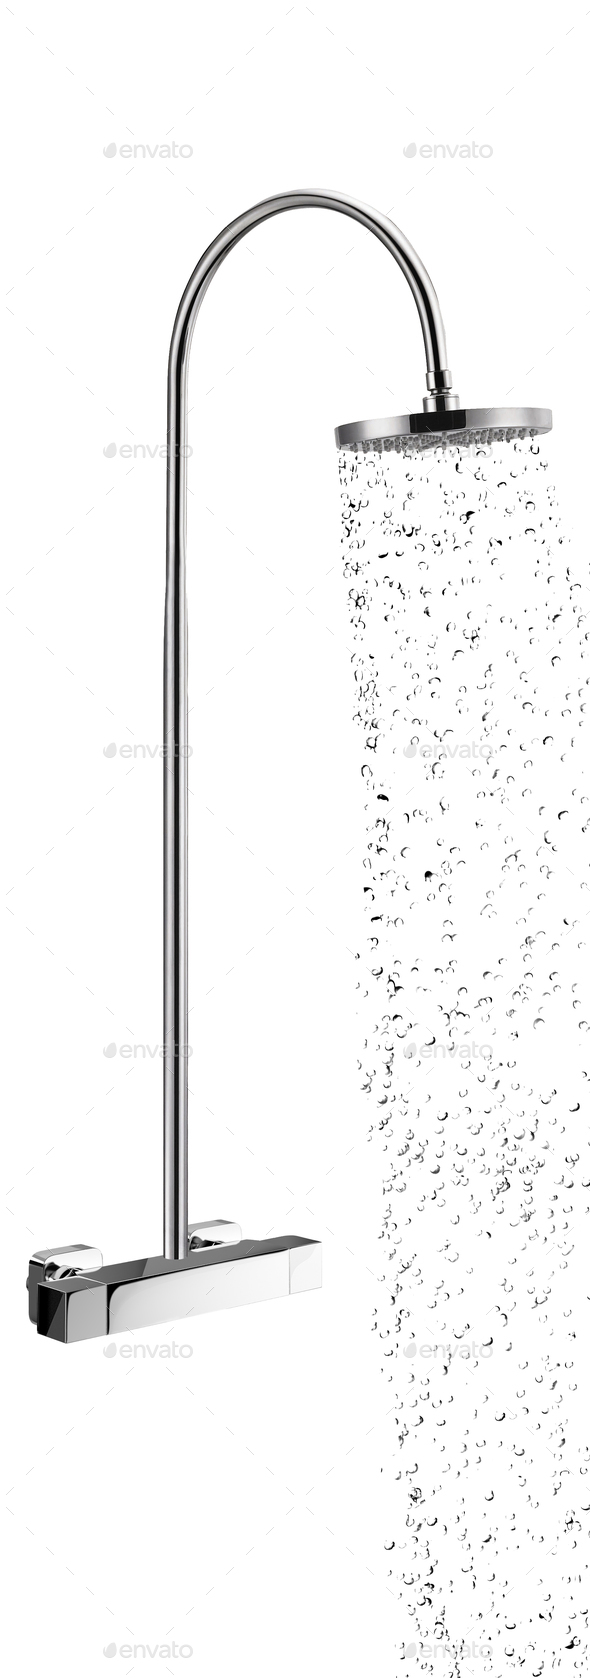 Full Chrome Shower Head Isolated on White Background - Stock Photo - Images